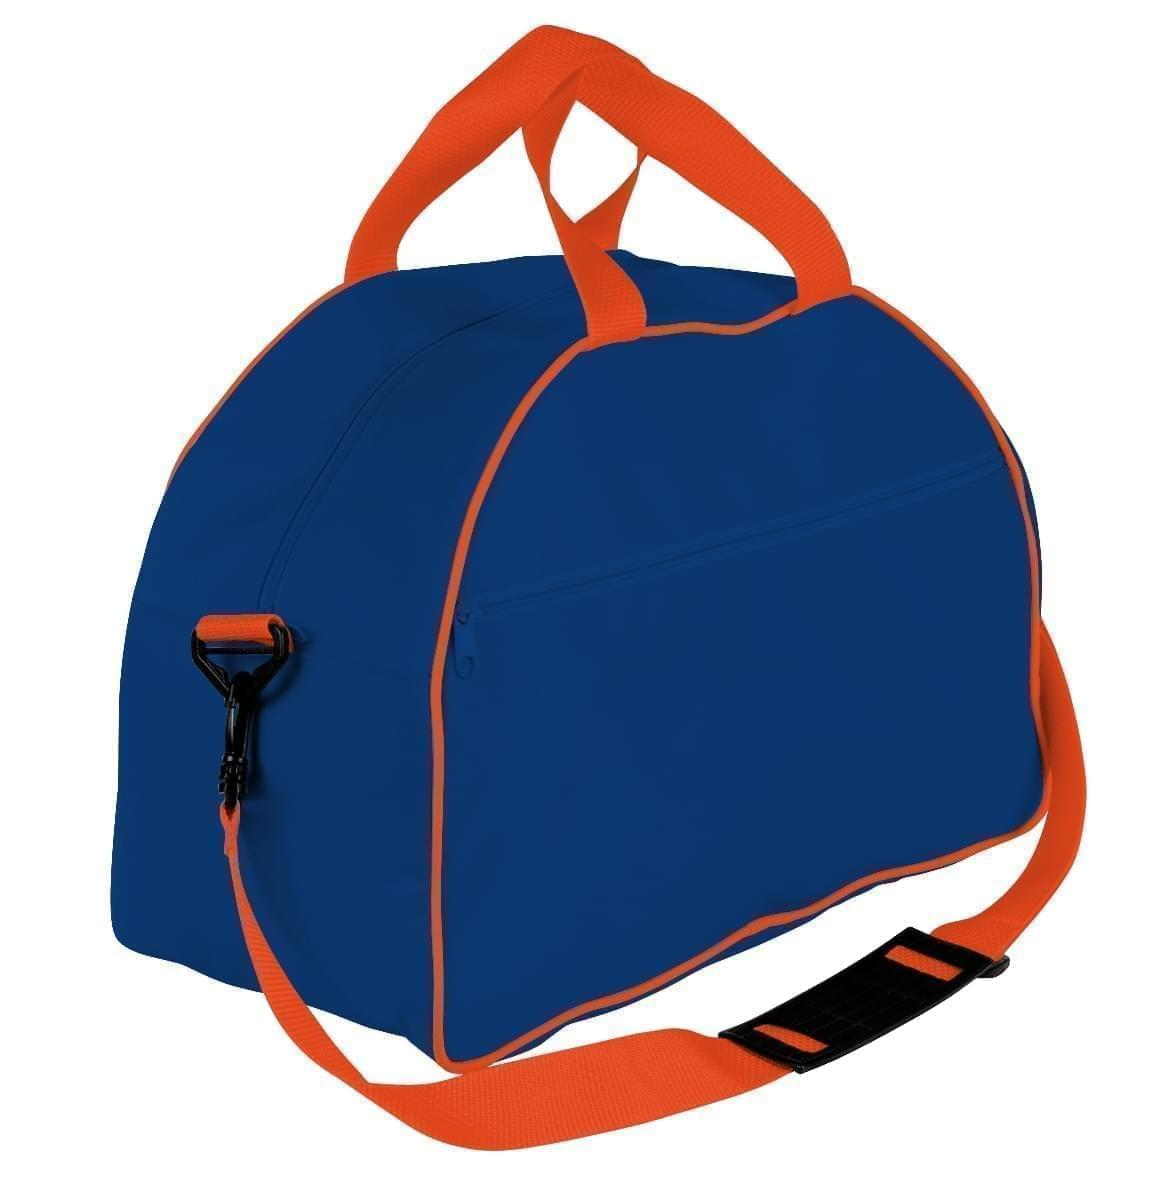 USA Made Nylon Poly Weekender Duffel Bags, Royal Blue-Orange, 6PKV32JA00